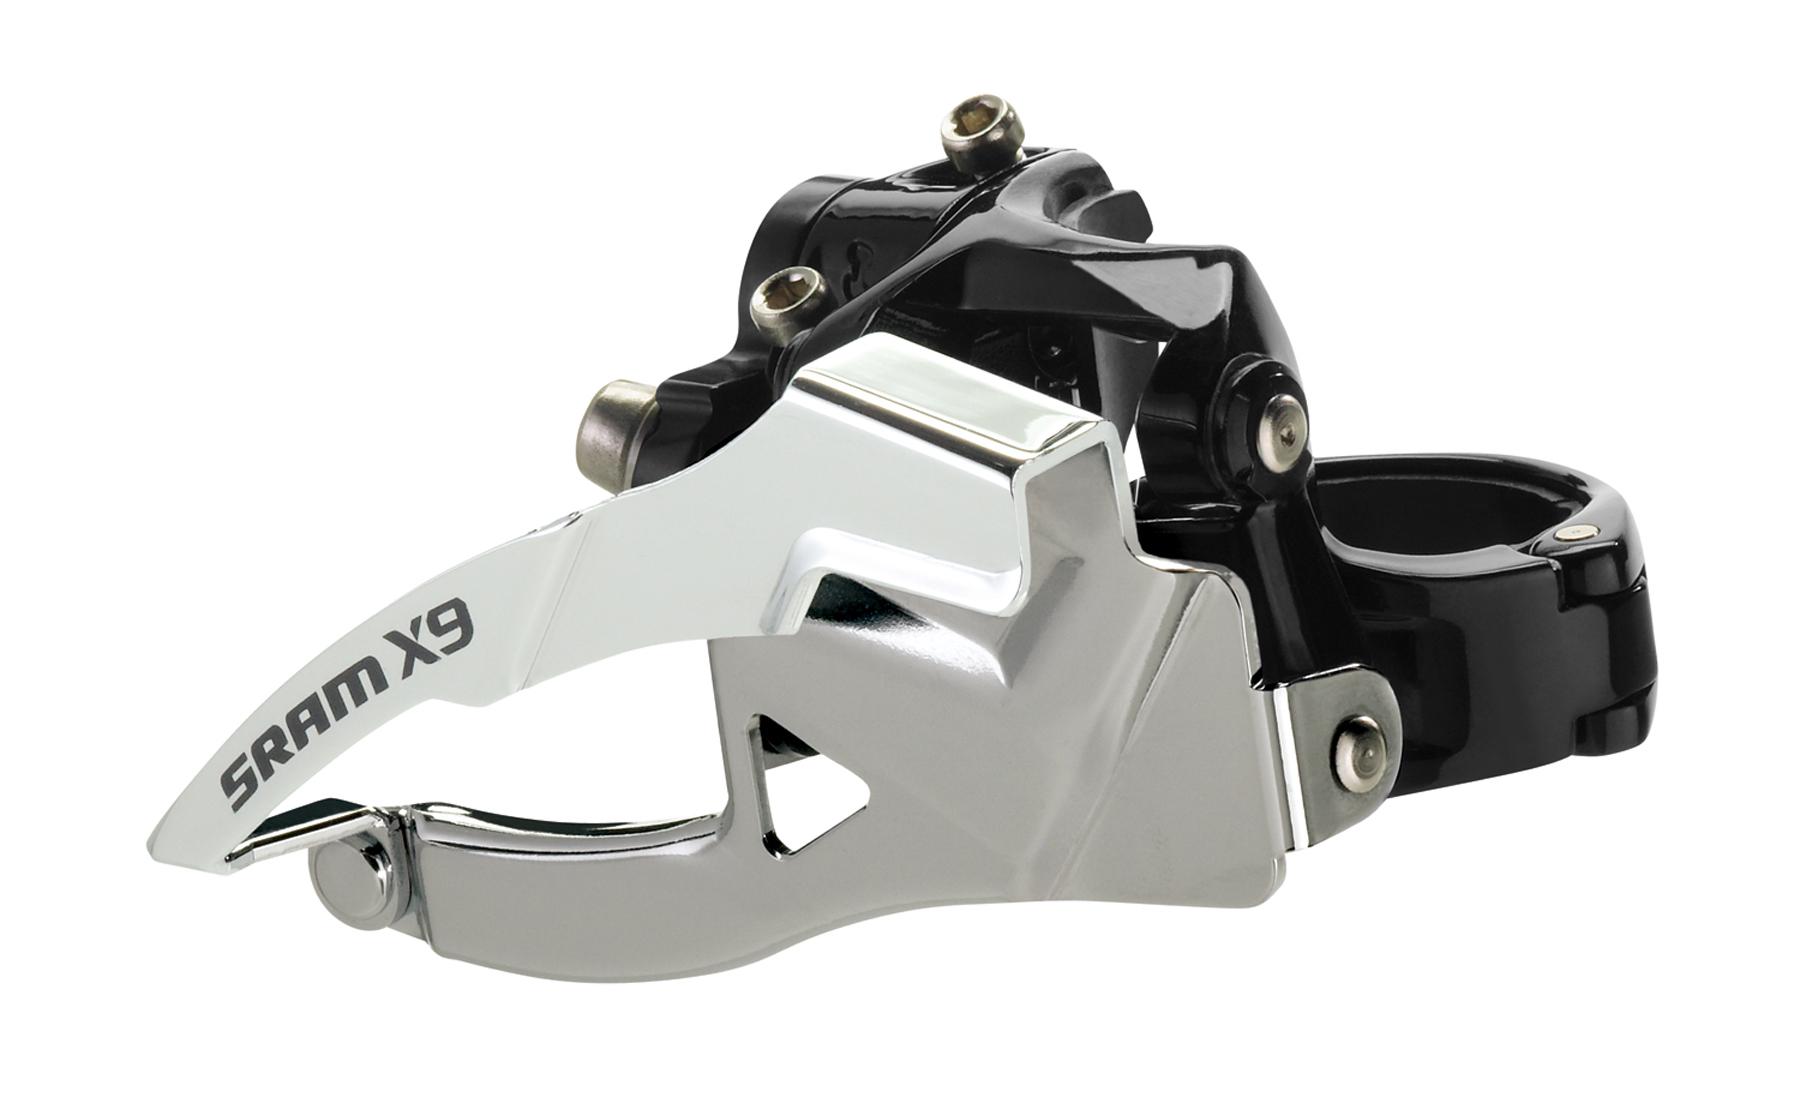 SRAM Front derailleur X9 Low direct mount S1 39T 2x10 speed Top pull | Front derailleur